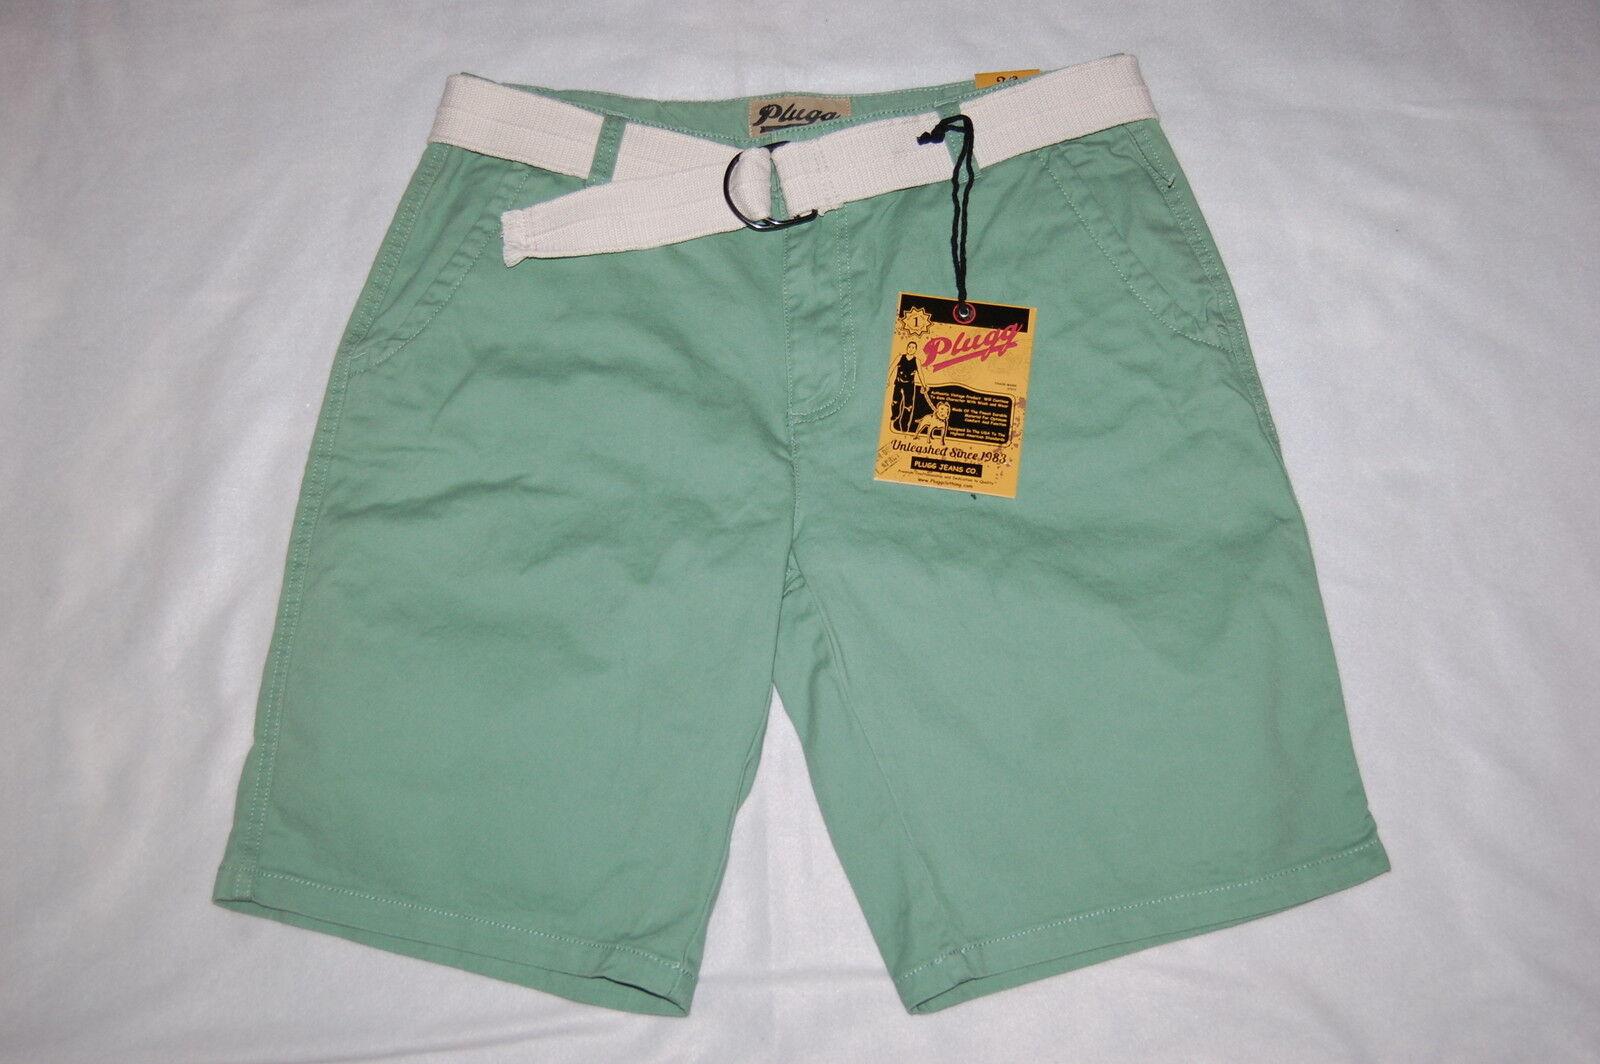 Mens SAGE GREEN DENIM SHORTS Off White Belt DRESSY CASUAL Tailored Pkts SIZE 36